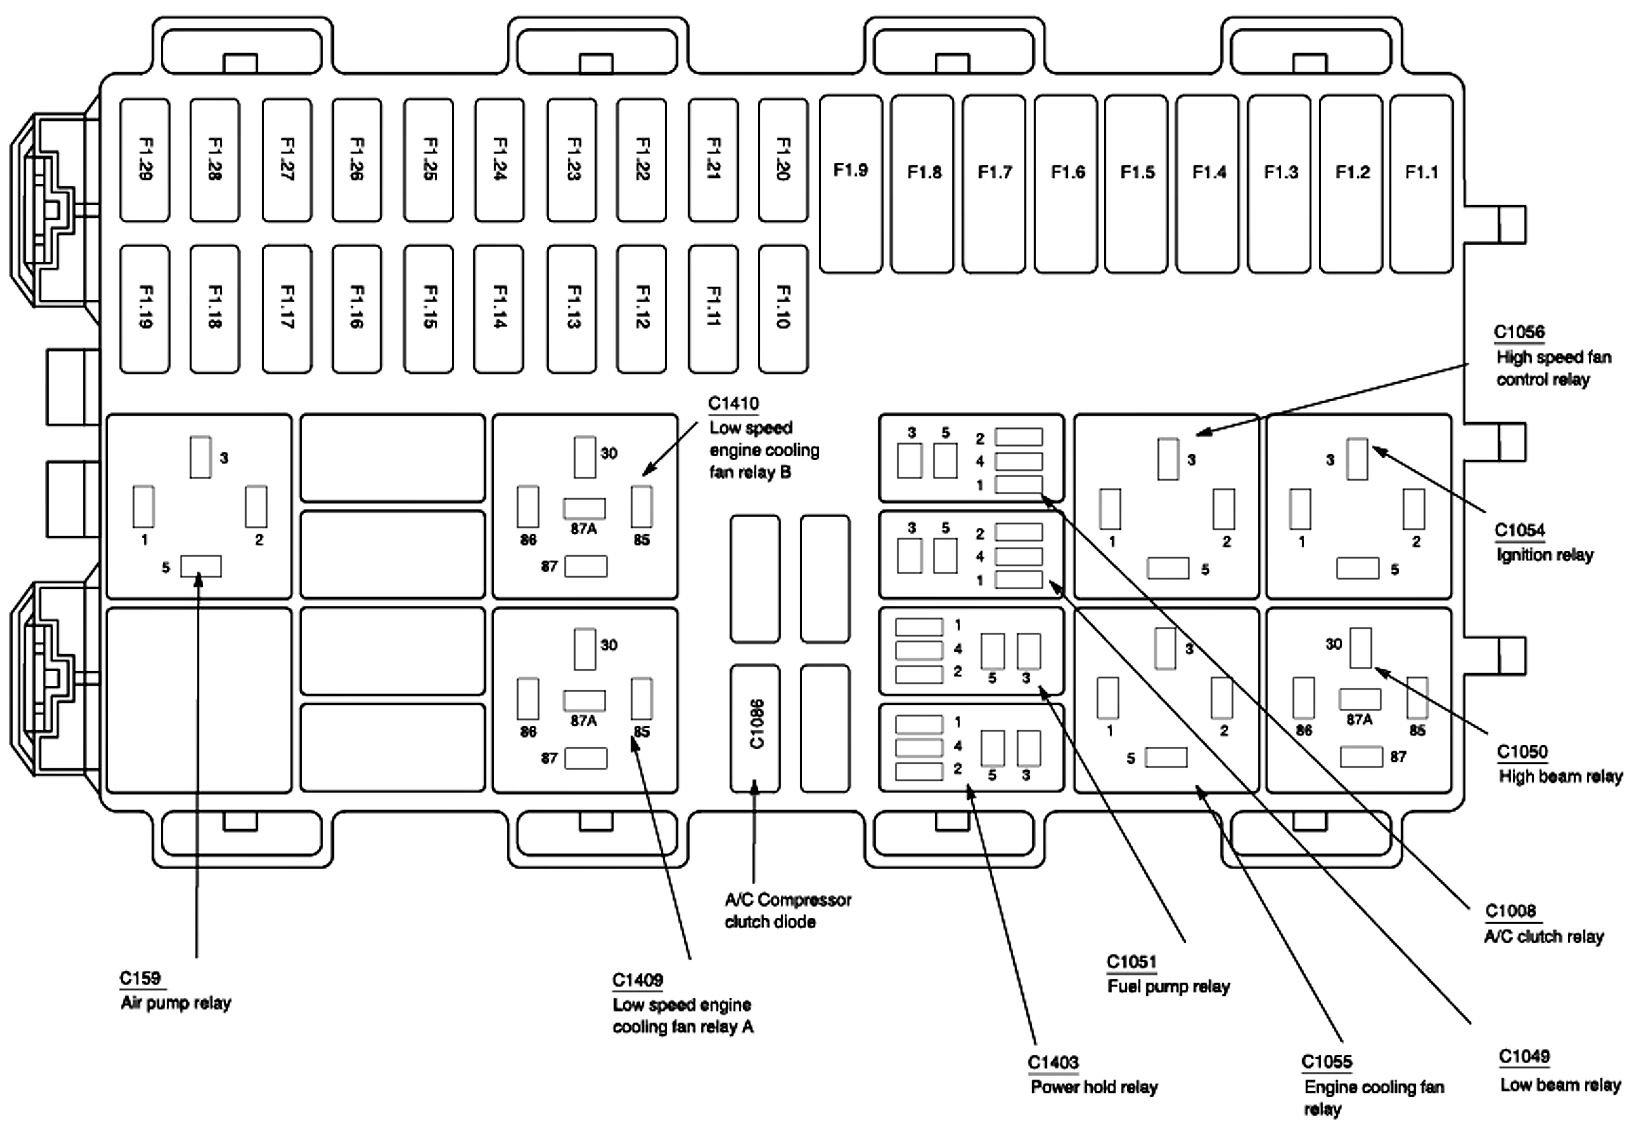 2002 Ford Focus Fuse Diagram Bege Wiring Diagram